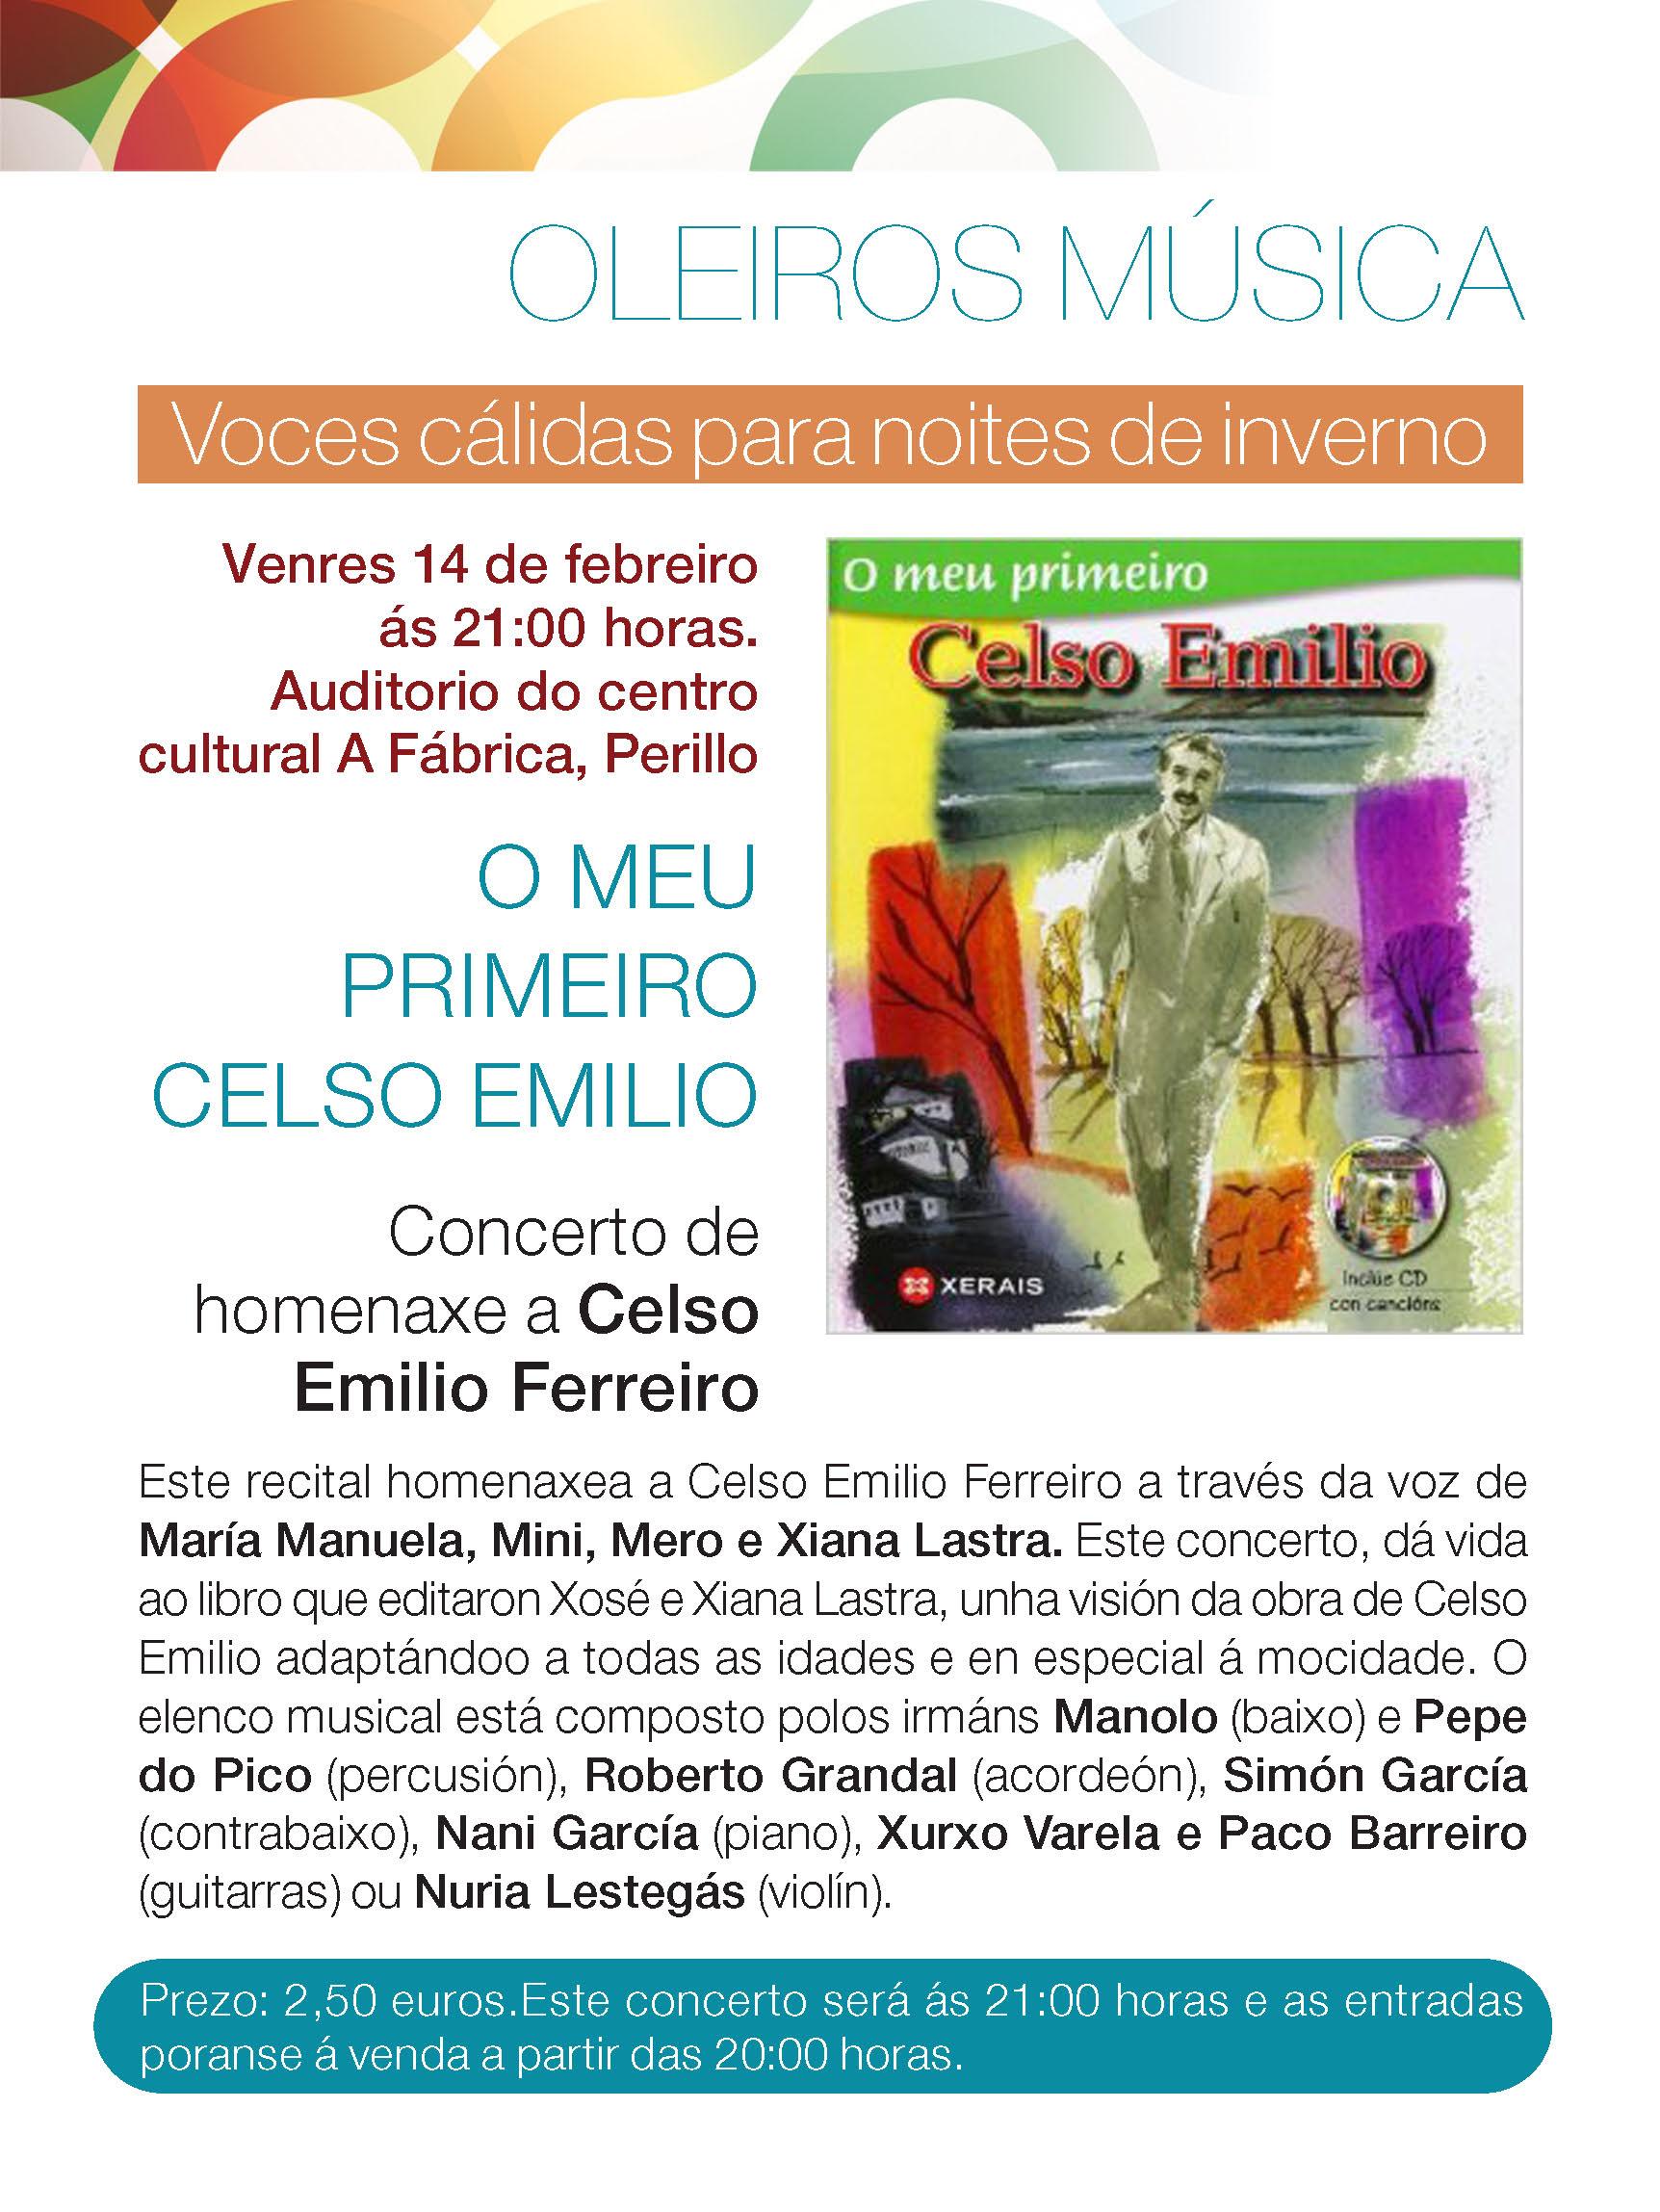 Homenaxe a Celso Emilio,Oleiros